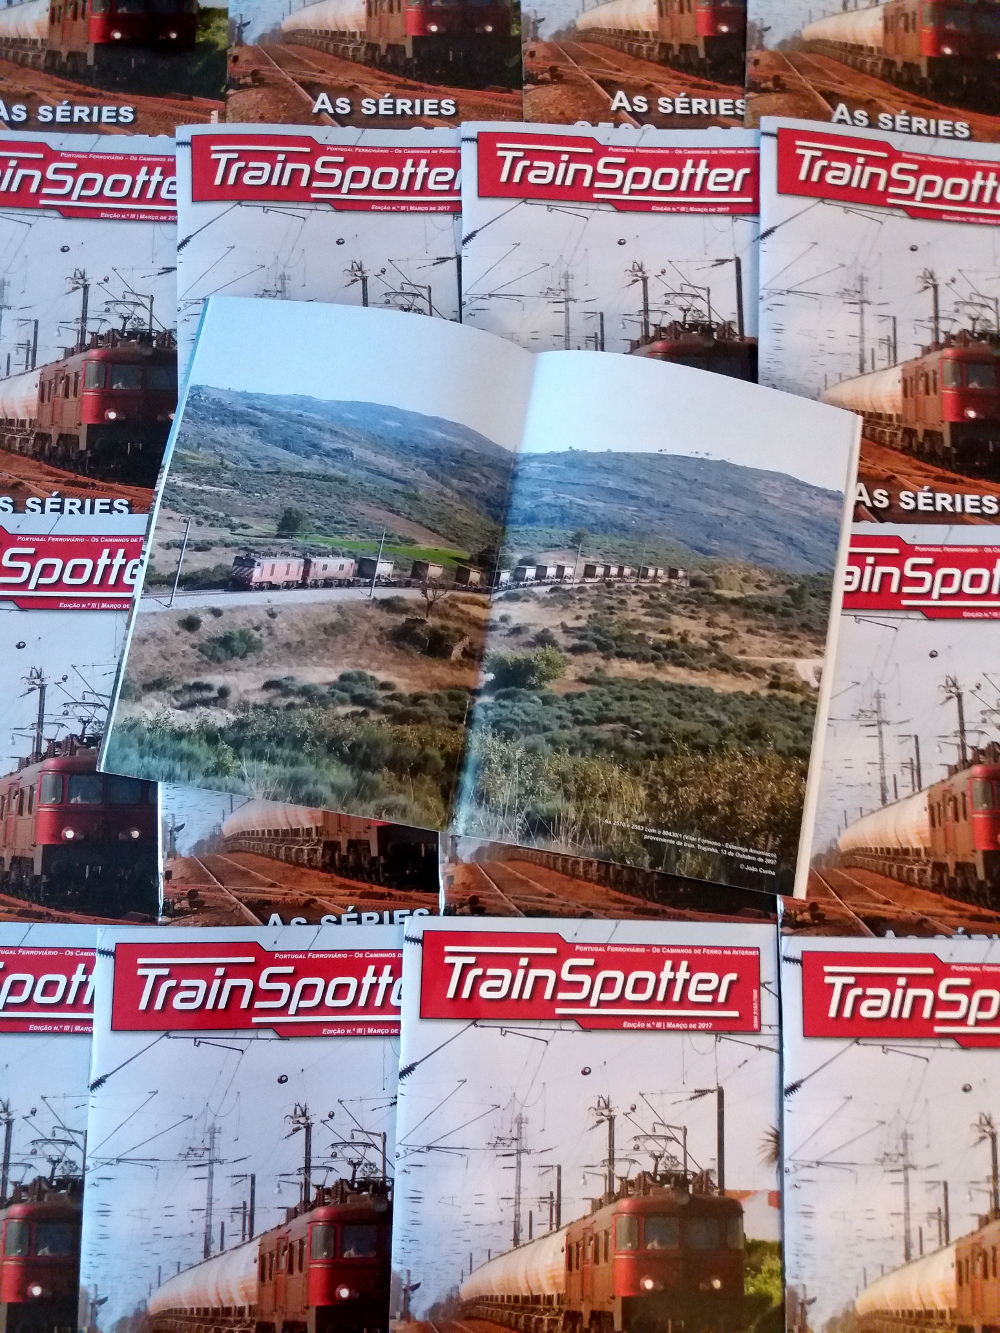 Trainspotter III já disponível (Atualizada)